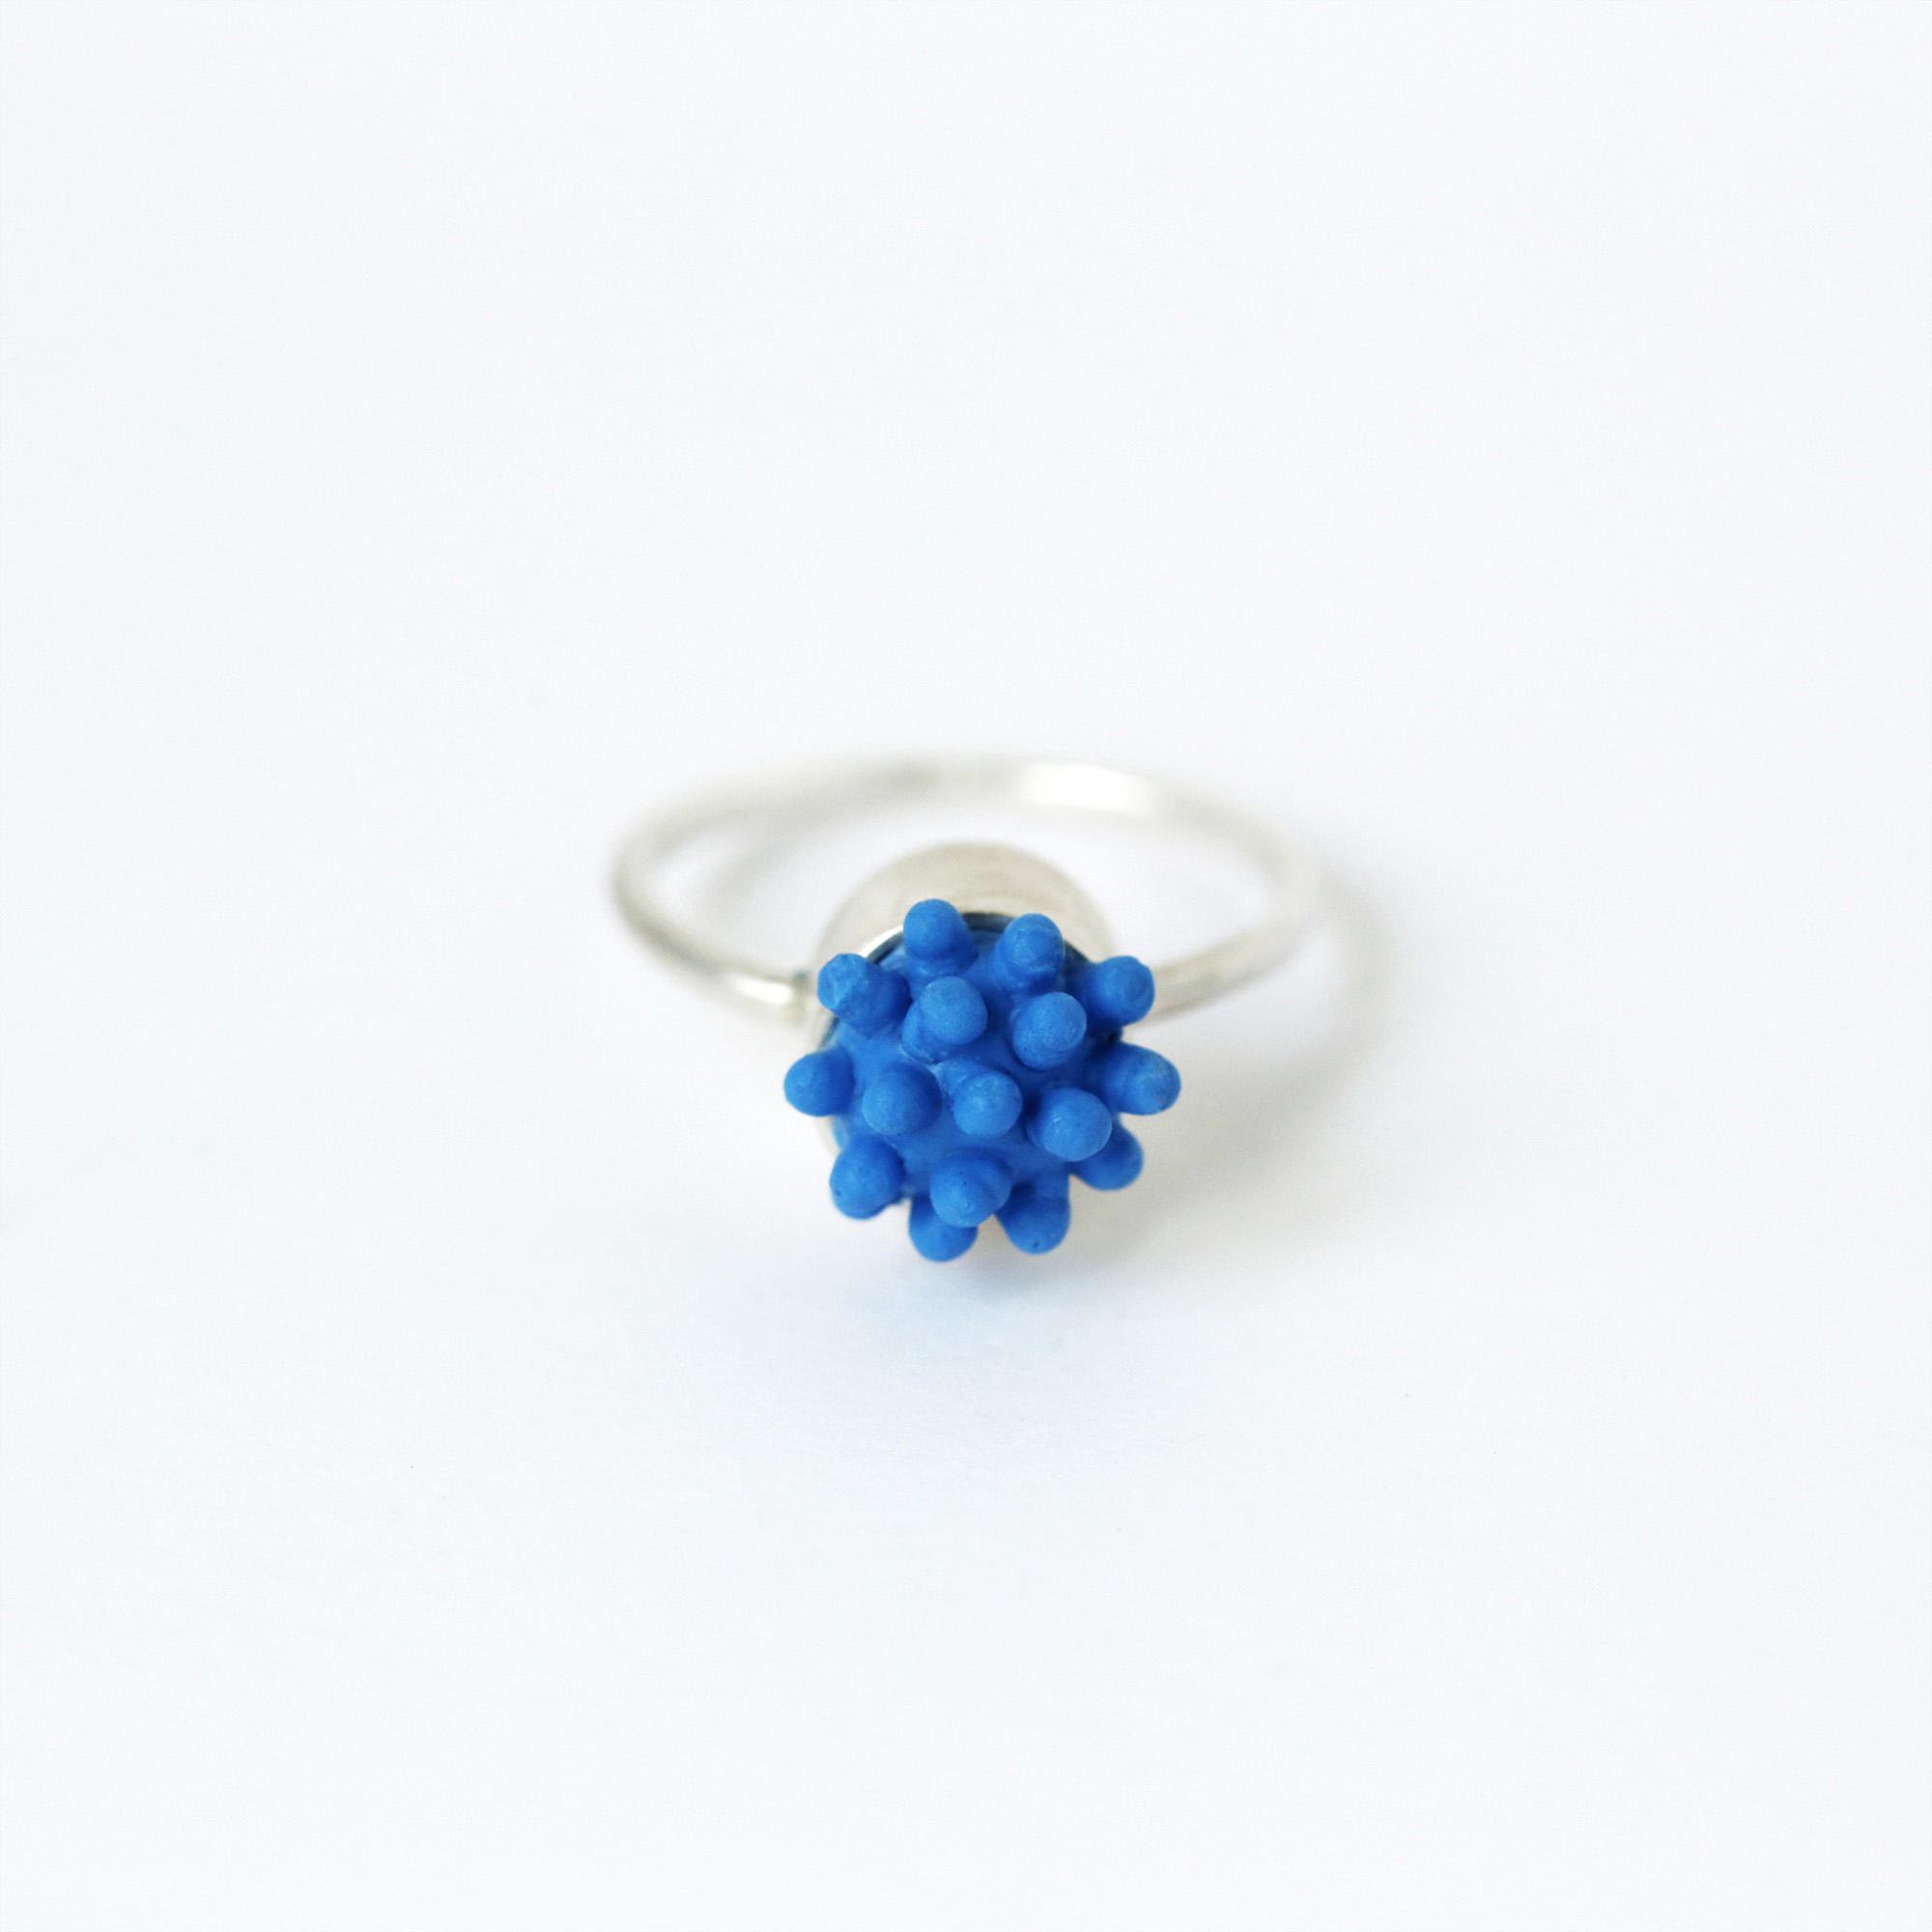 dovile b. nautilus hard soft statement tiny blue ring